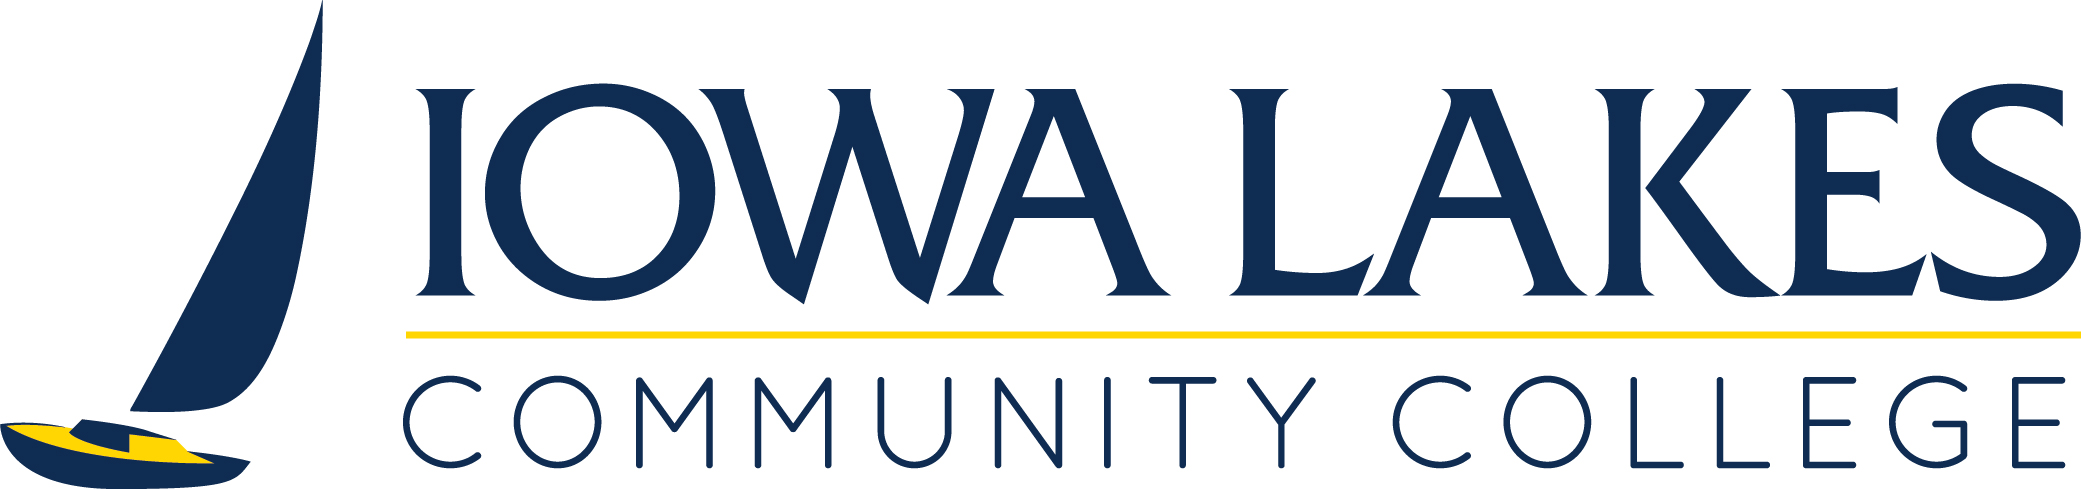 Iowa Lakes Community College Logo